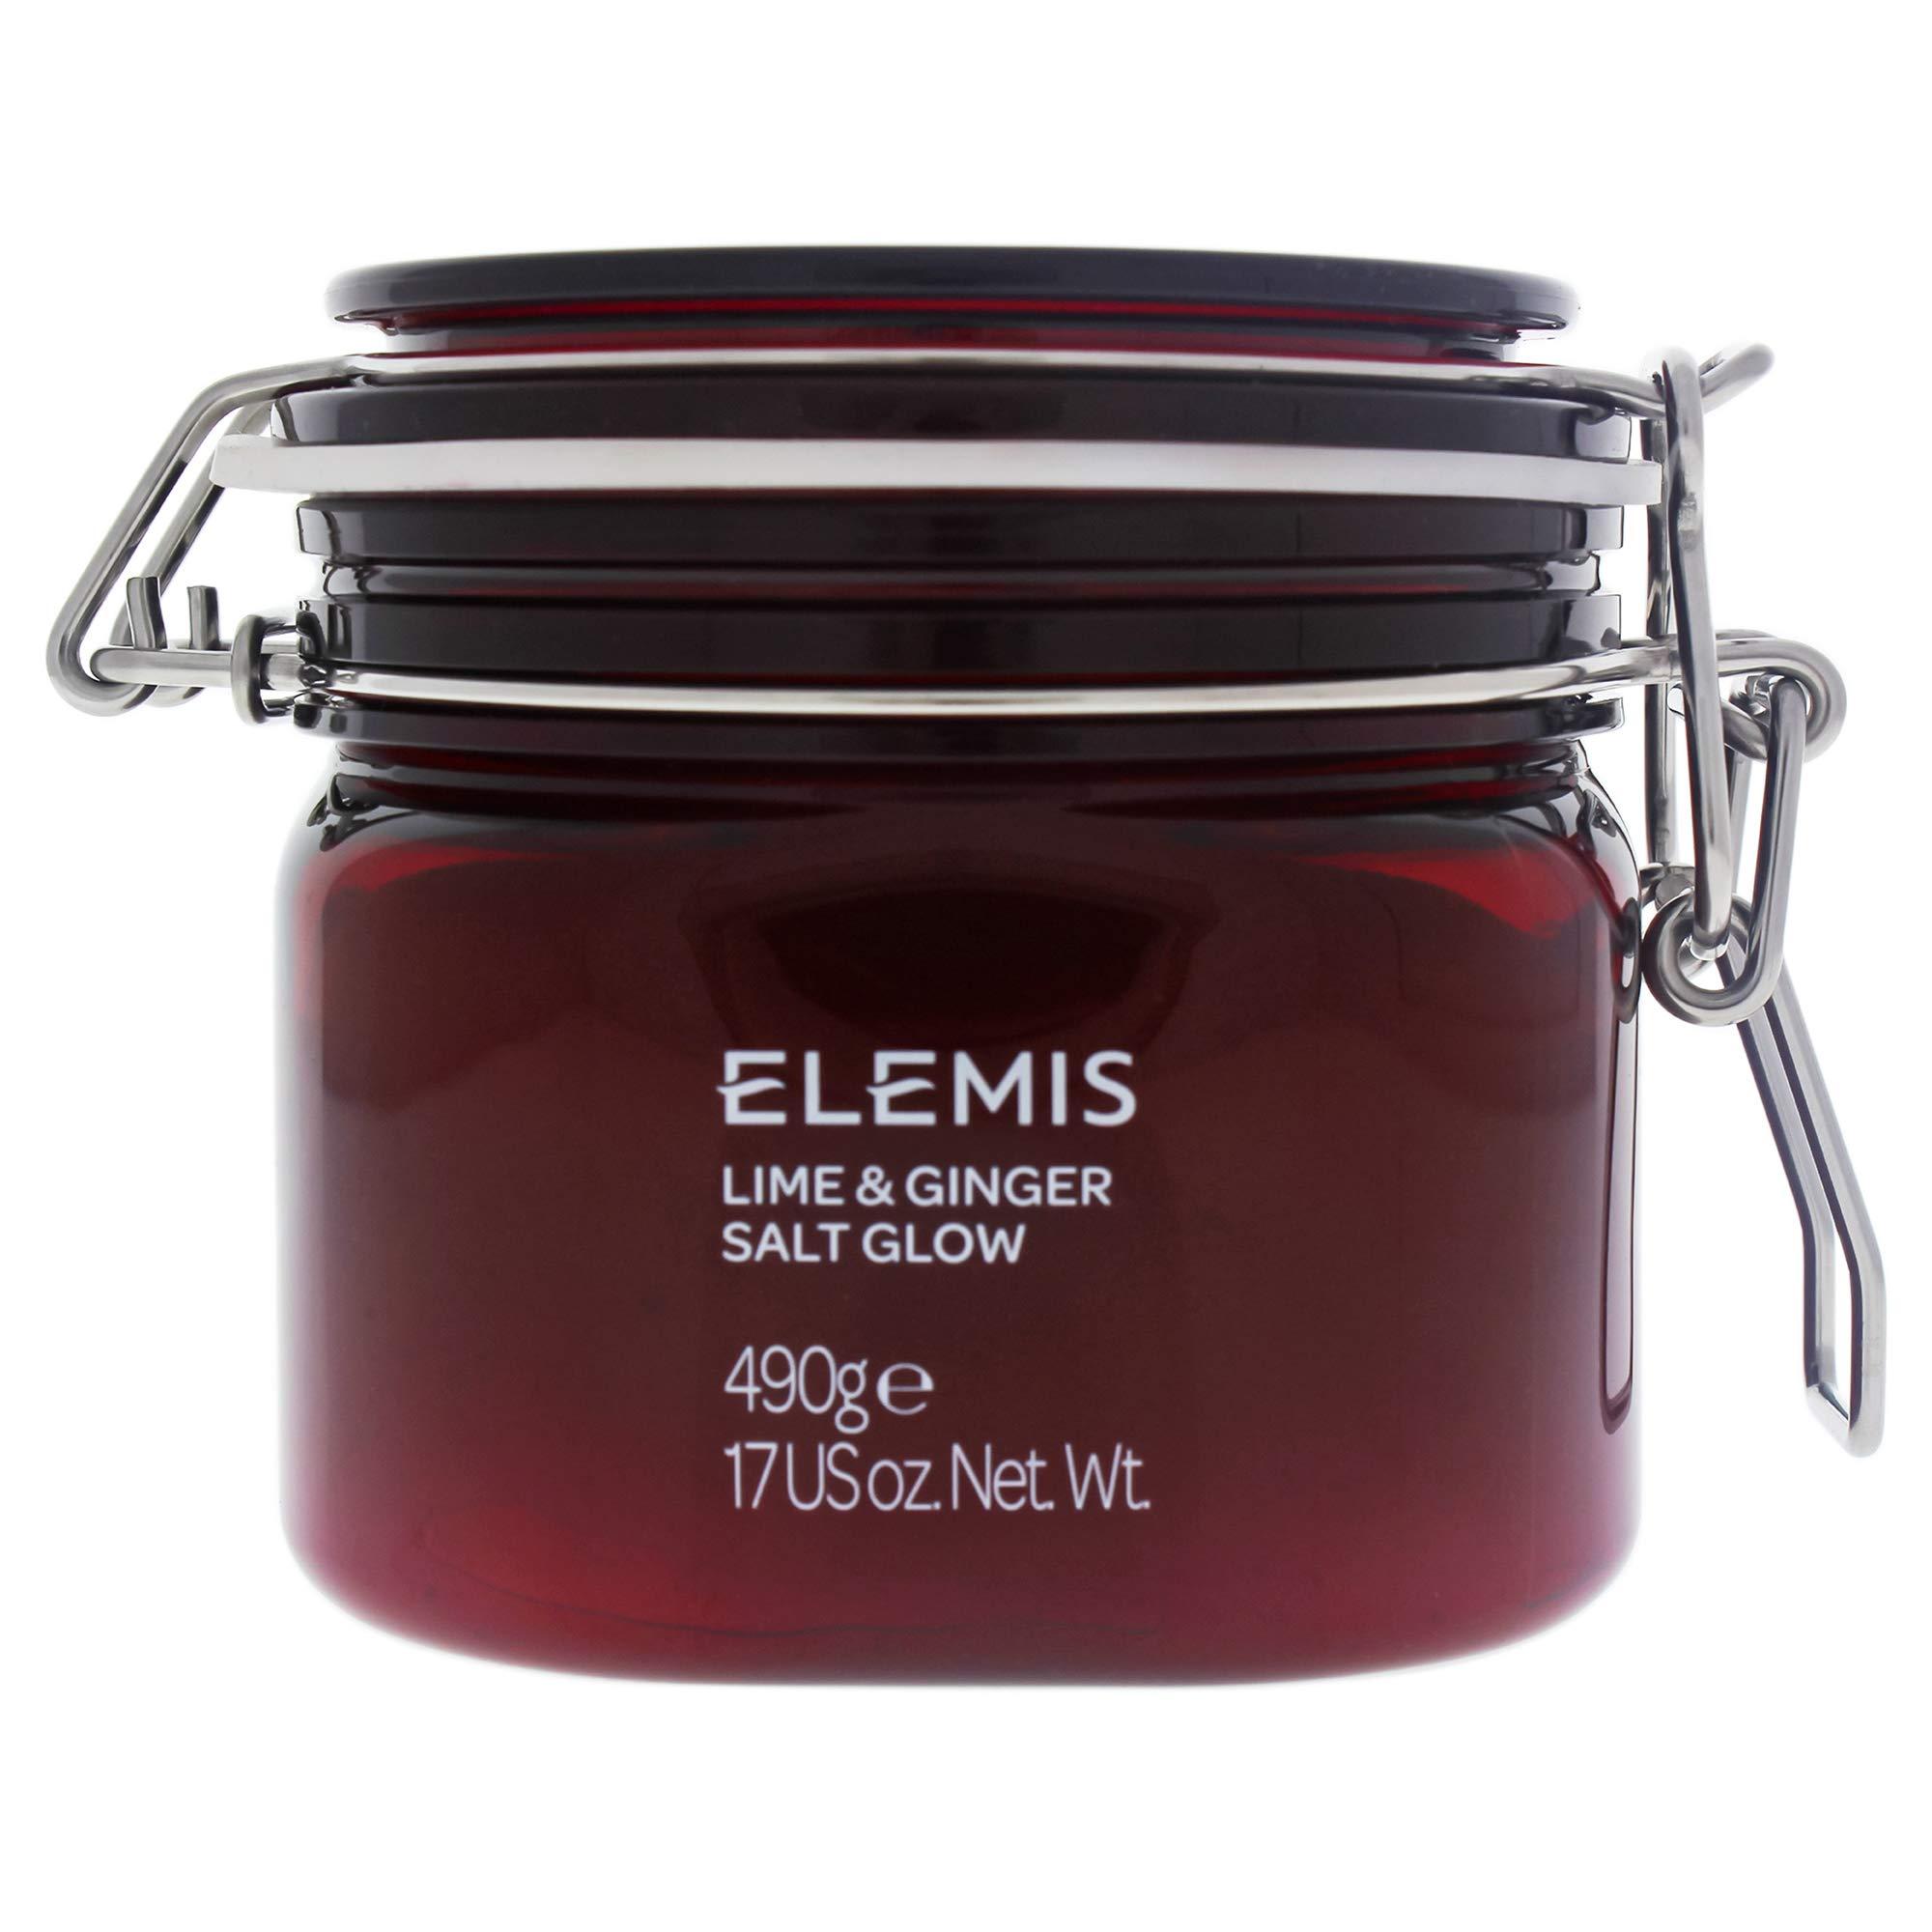 ELEMIS Lime and Ginger Salt Glow Invigorating Salt Scrub, 17 oz